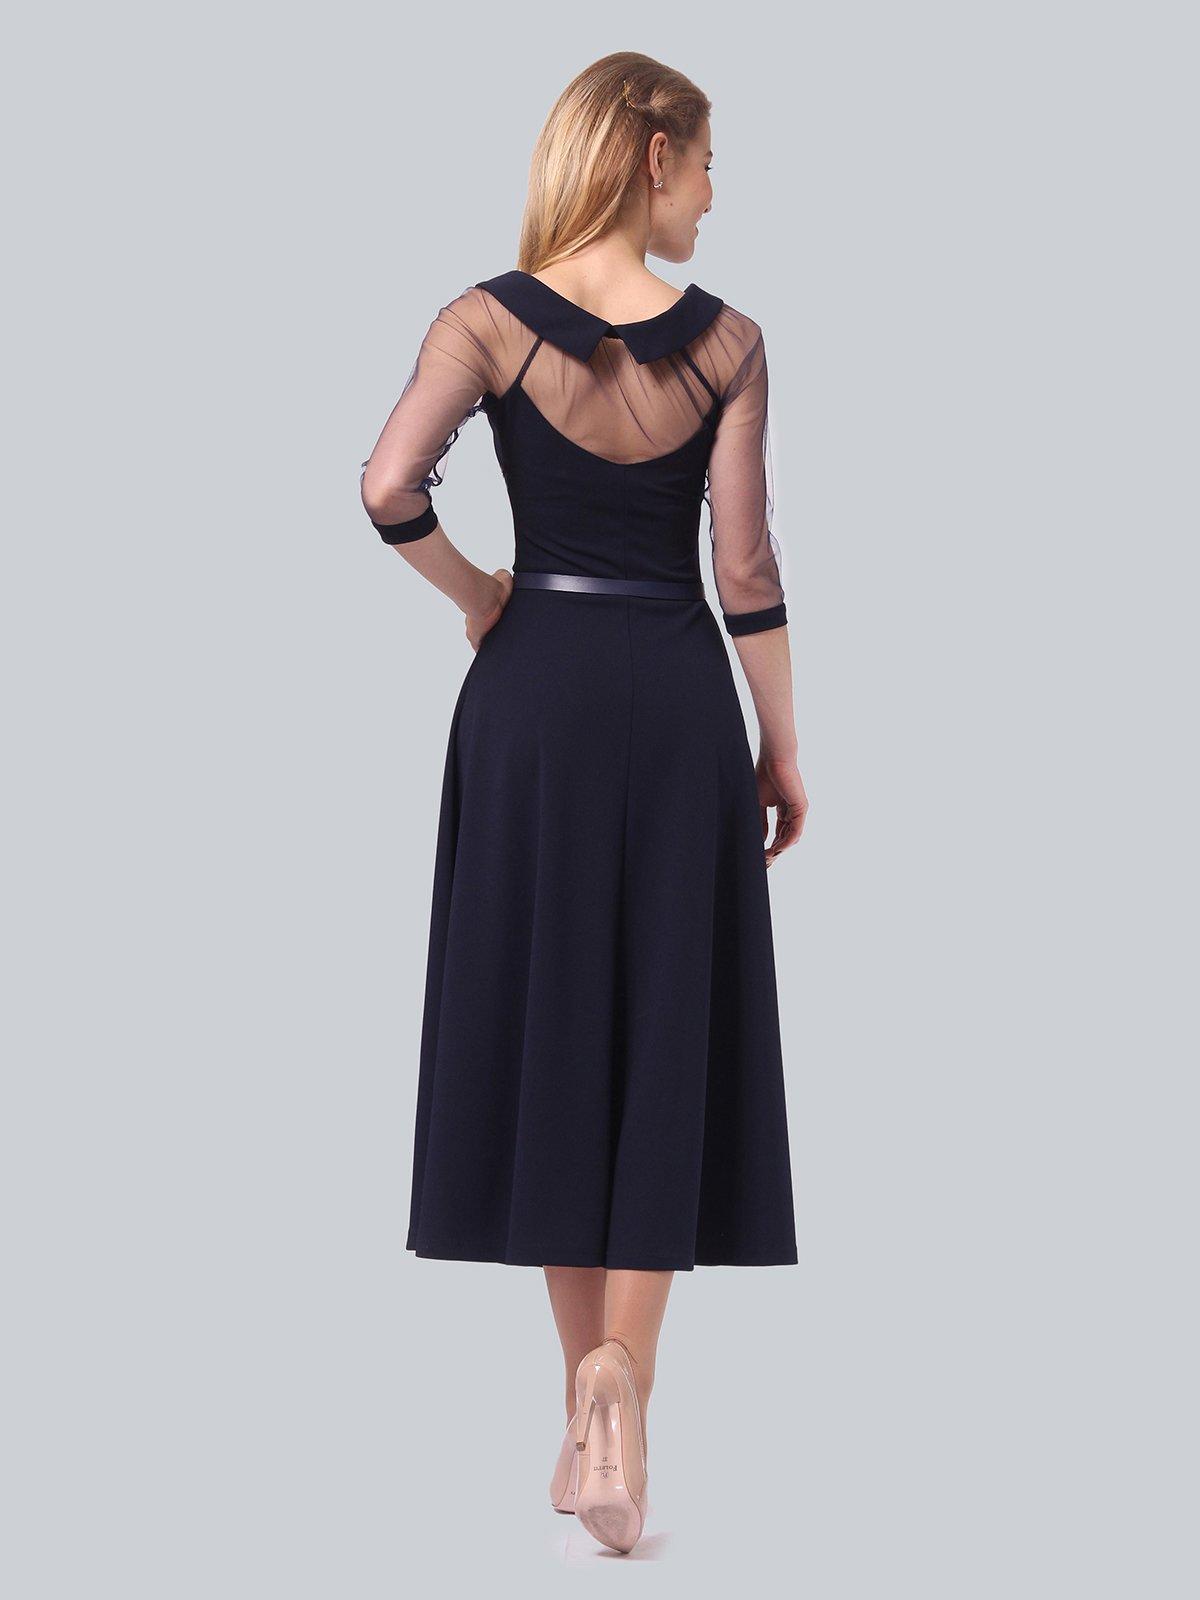 Платье темно-синее | 3879718 | фото 6